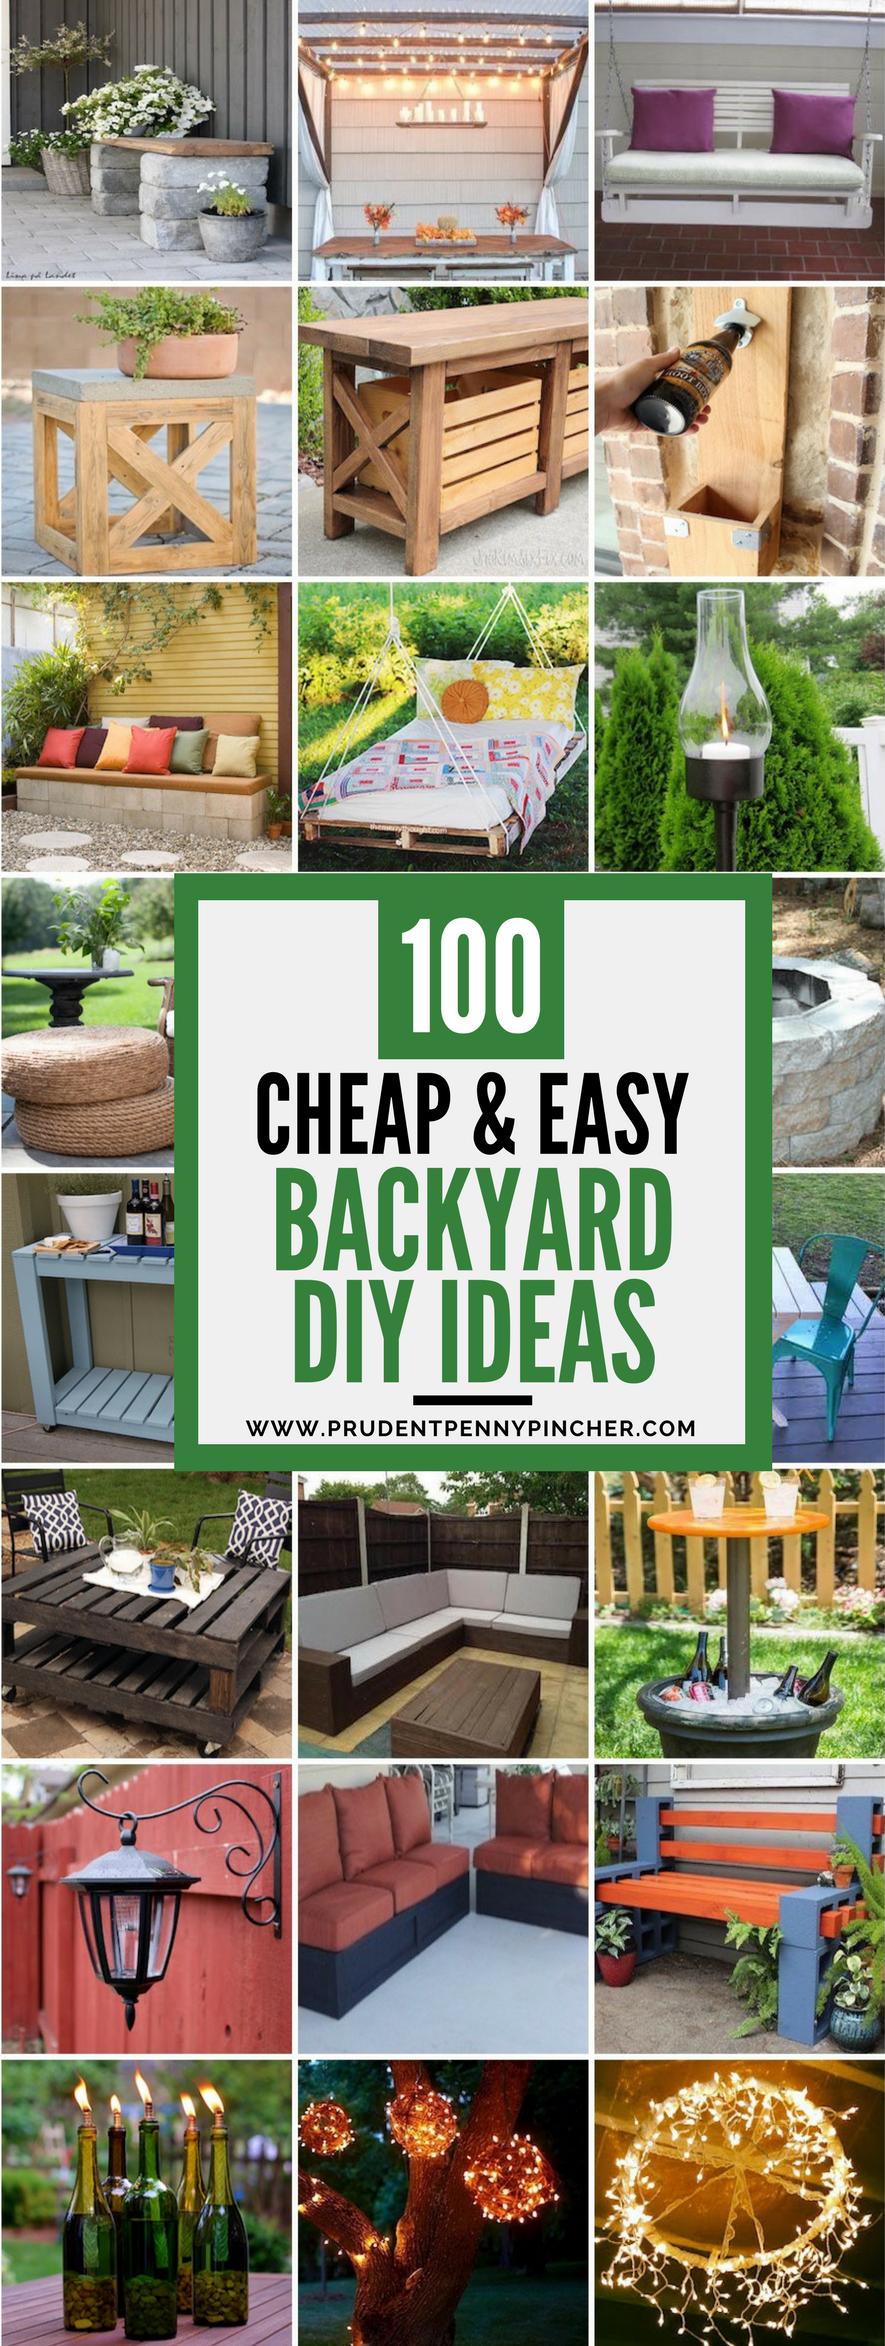 DIY Backyard Ideas  79